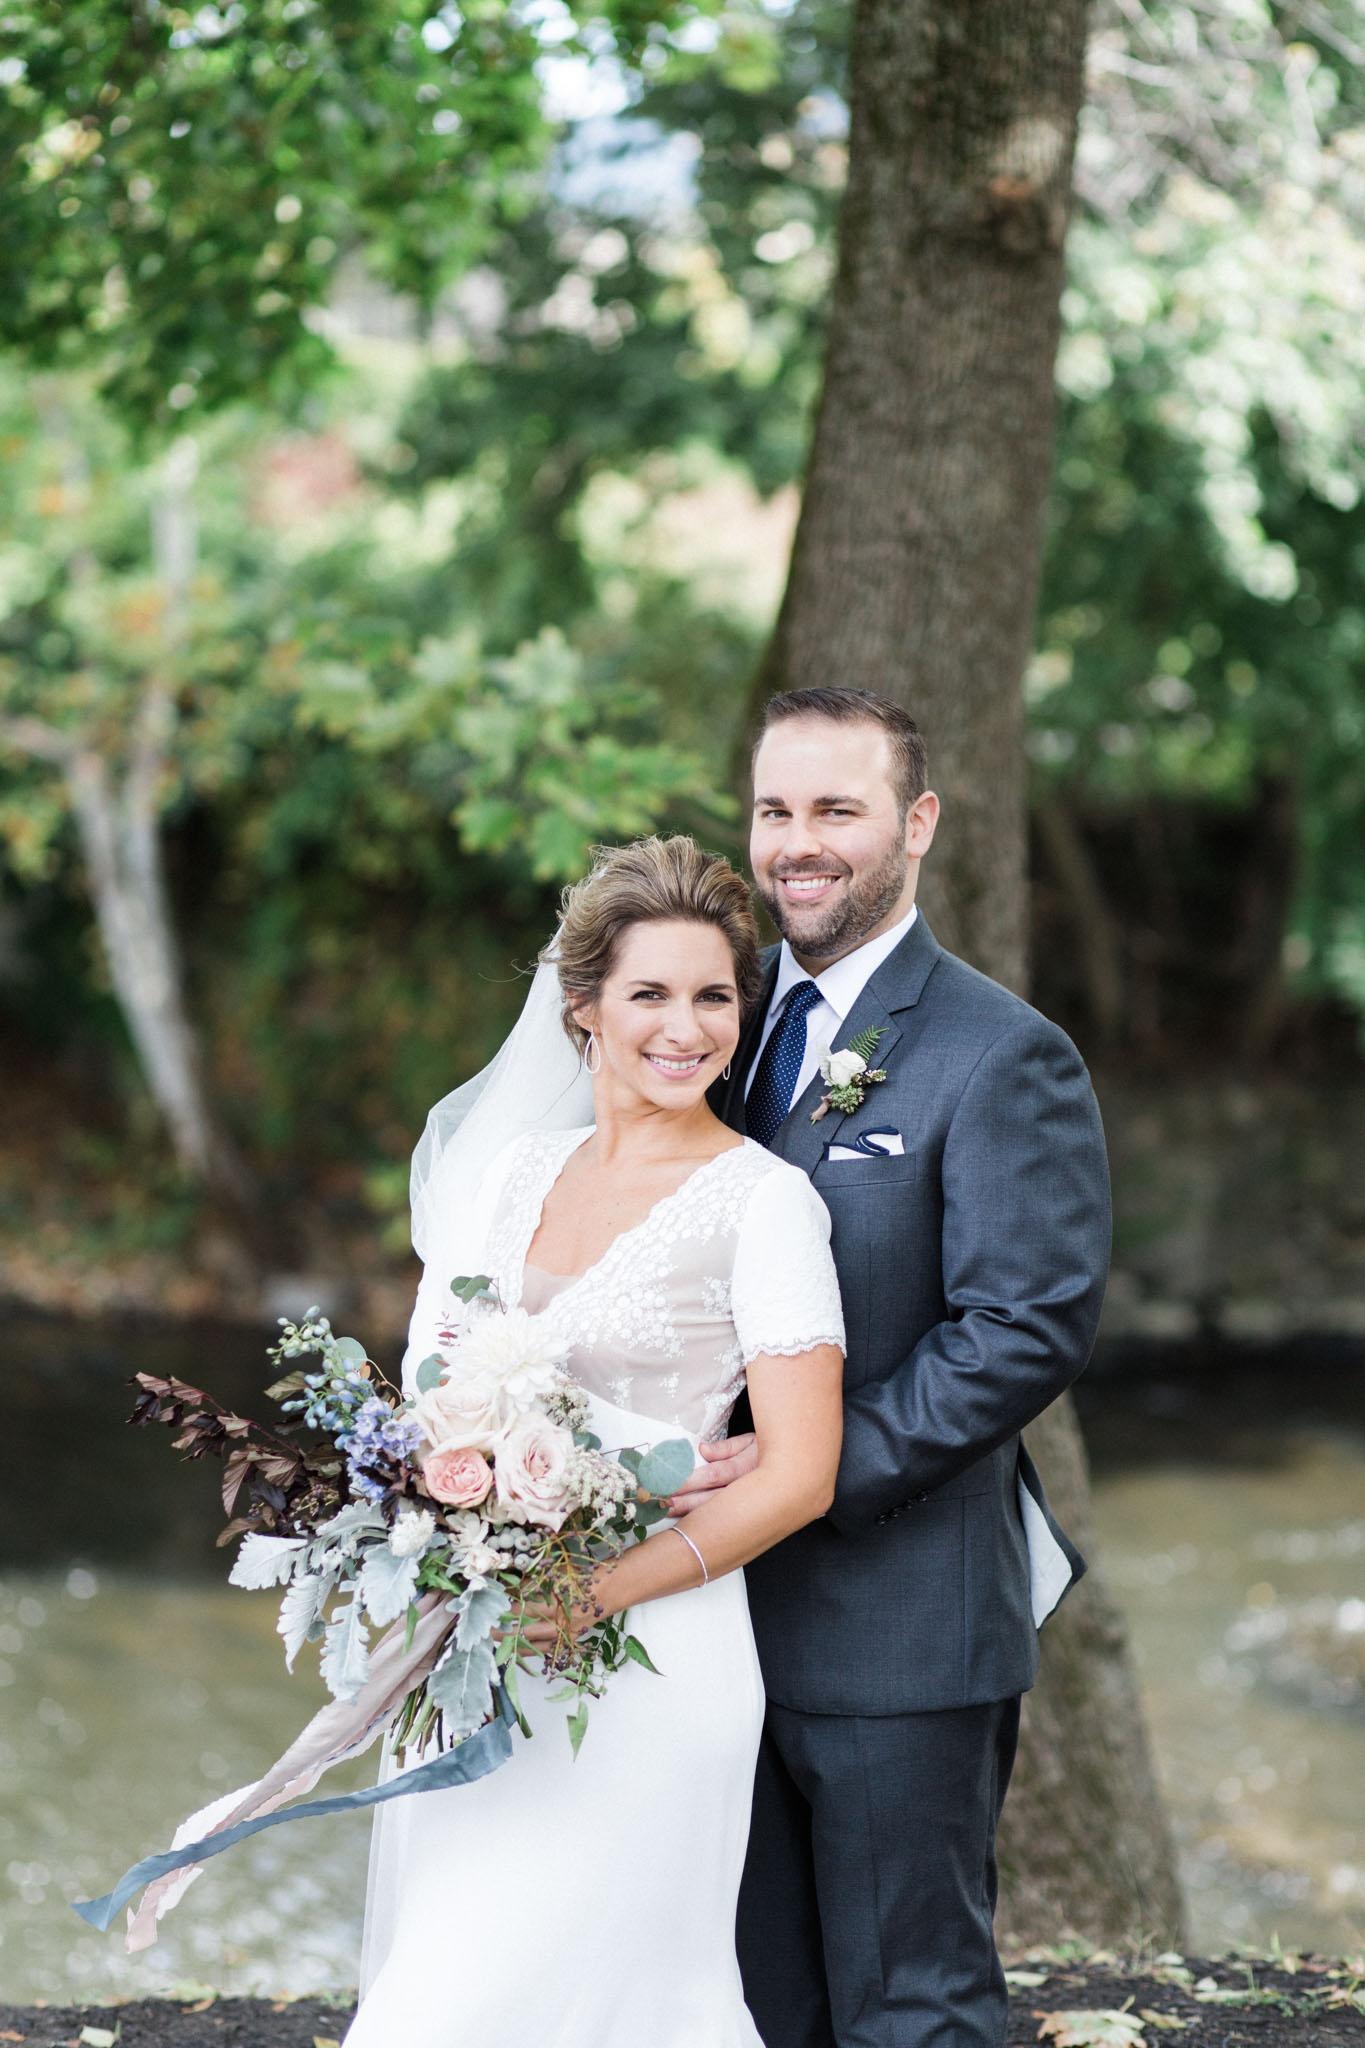 HiloandGinger-Brian+Dina_Weddingday_SneakPeek-15.jpg